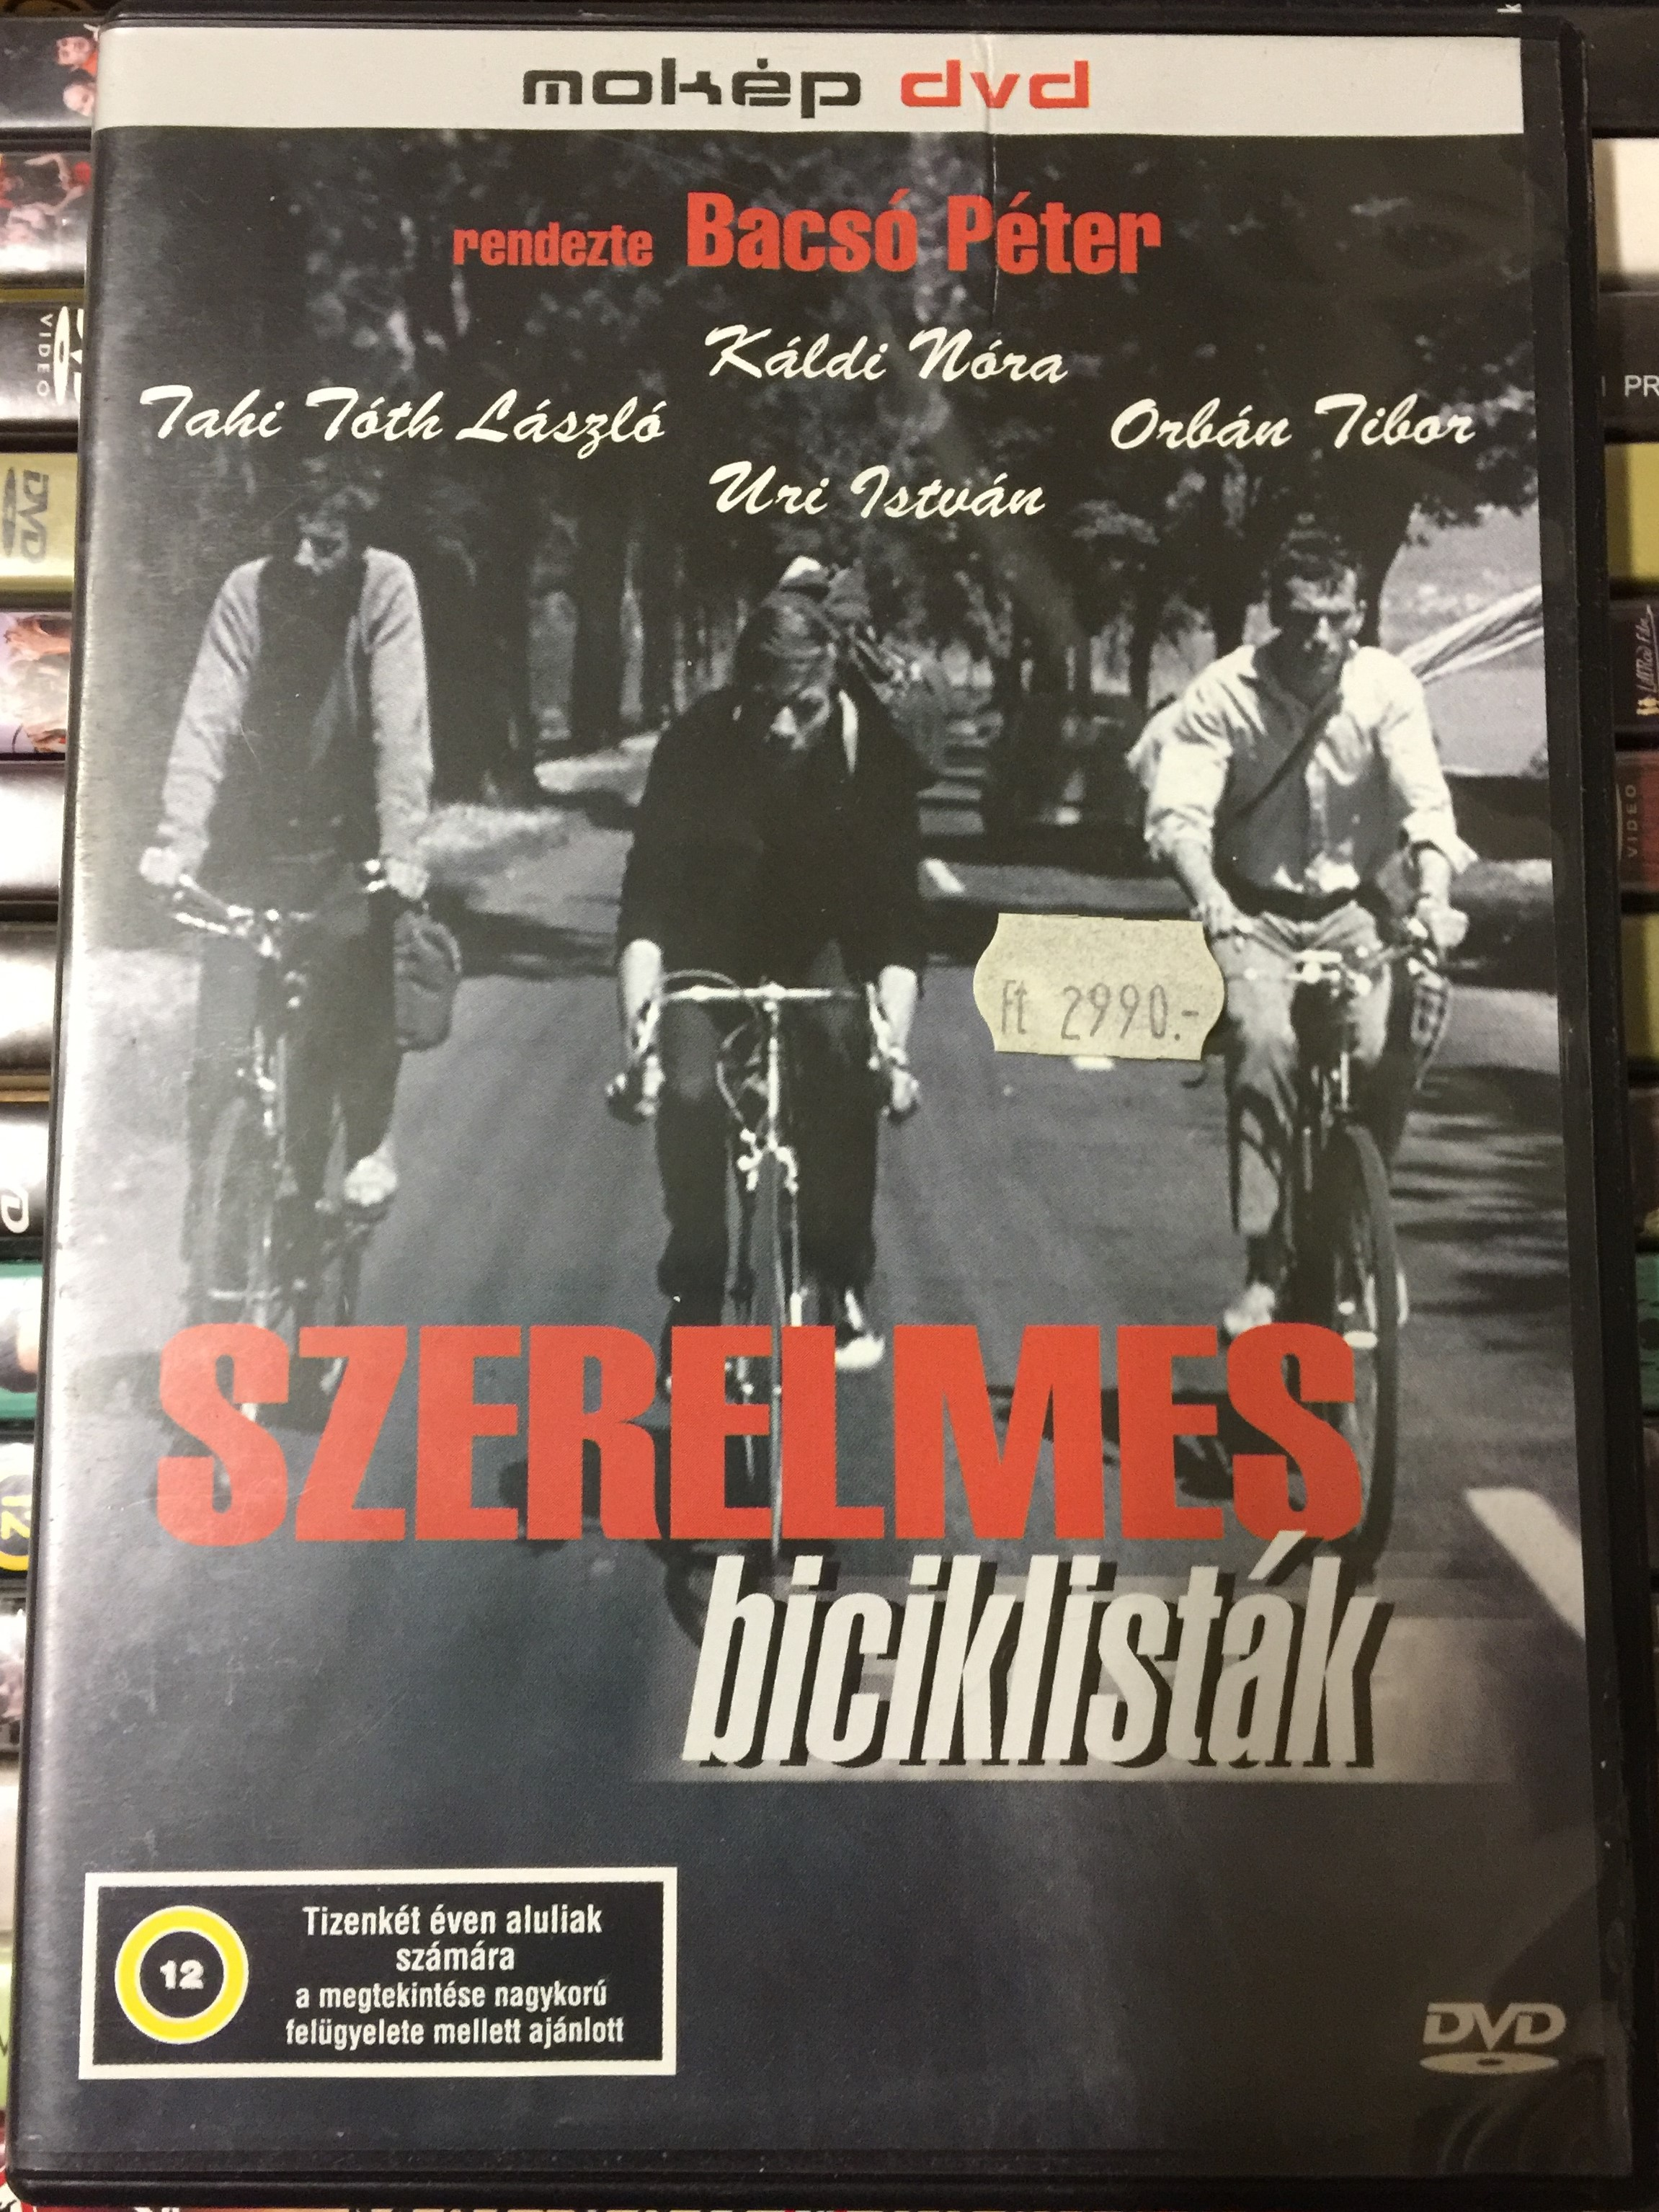 szerelmes-biciklist-k-dvd-1965-directed-by-bacs-p-ter-1.jpg